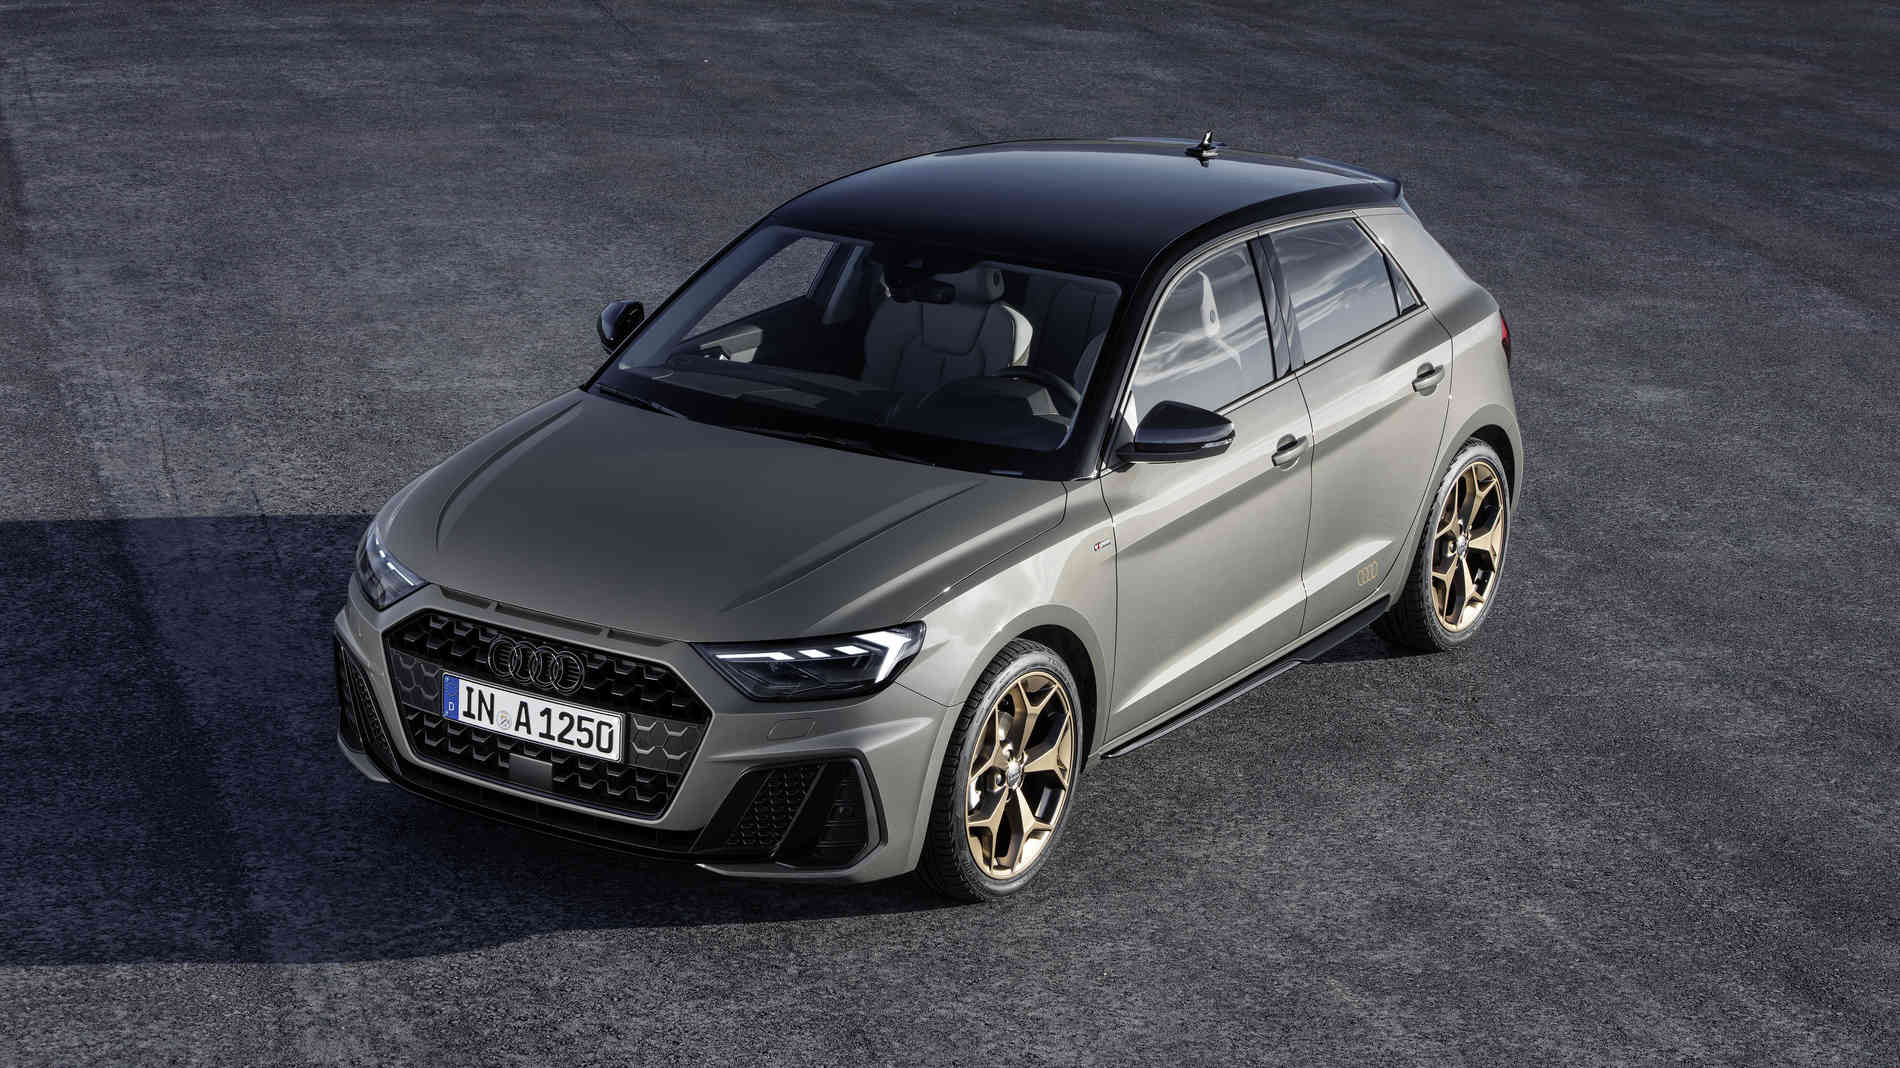 Audi A1 Sportback 40 Hoch Angesiedelt